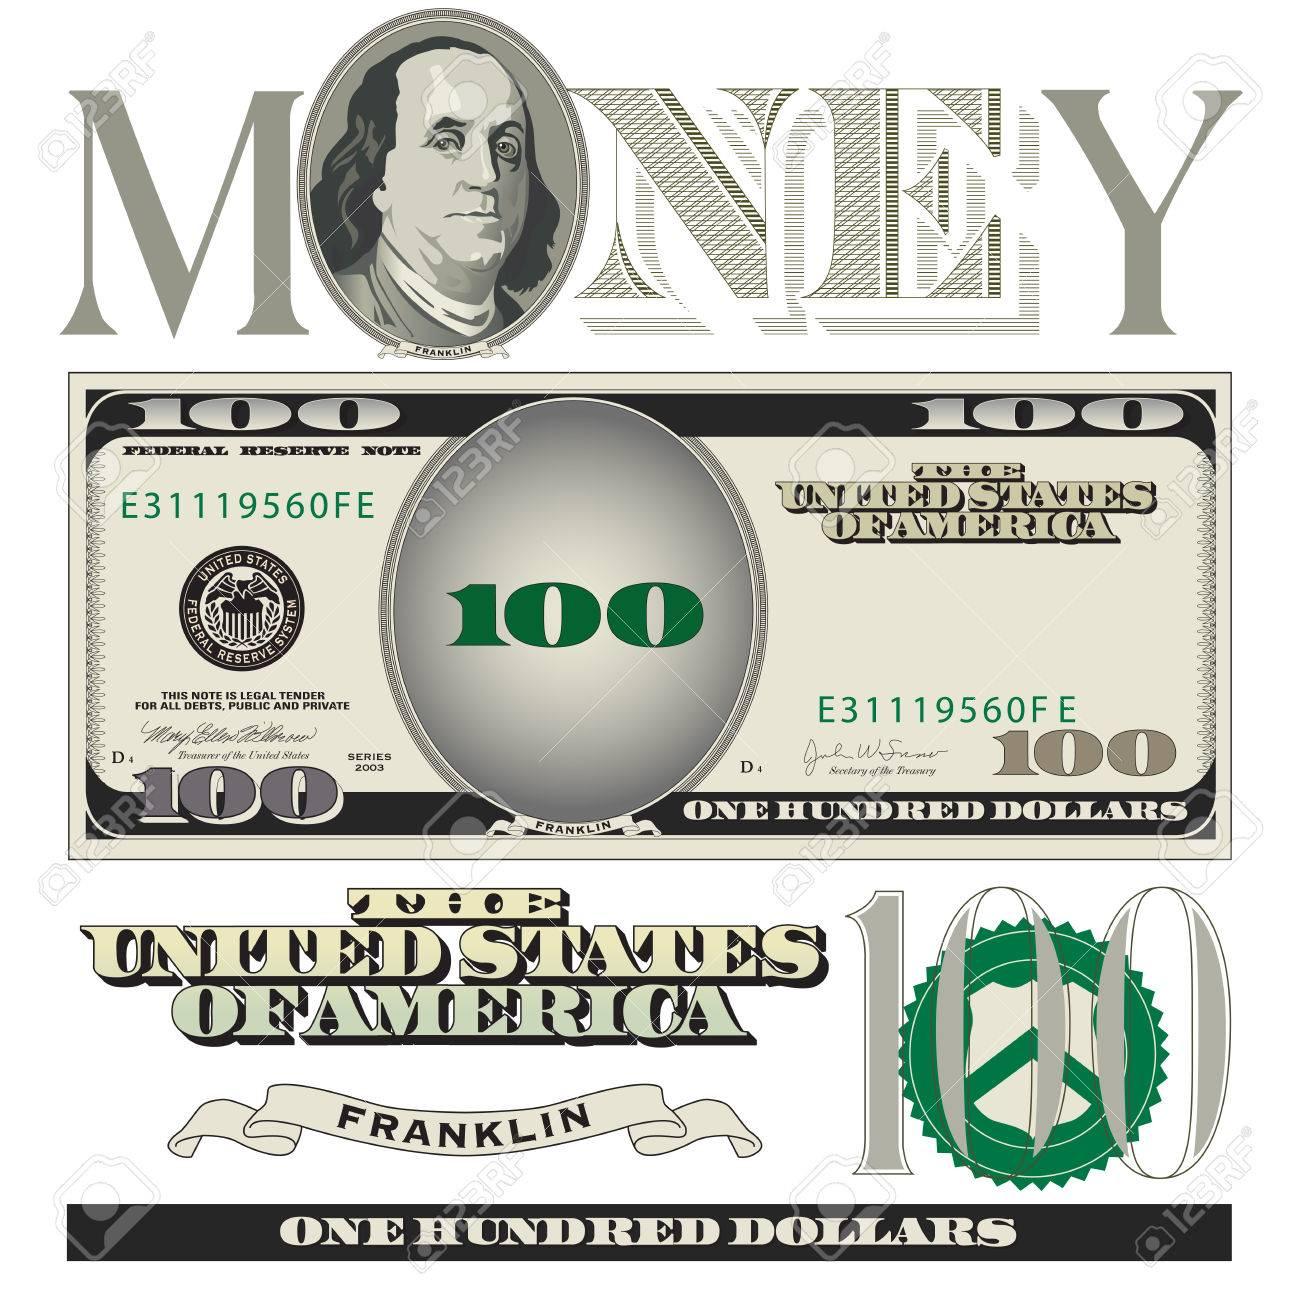 Miscellaneous 100 dollar bill elements.